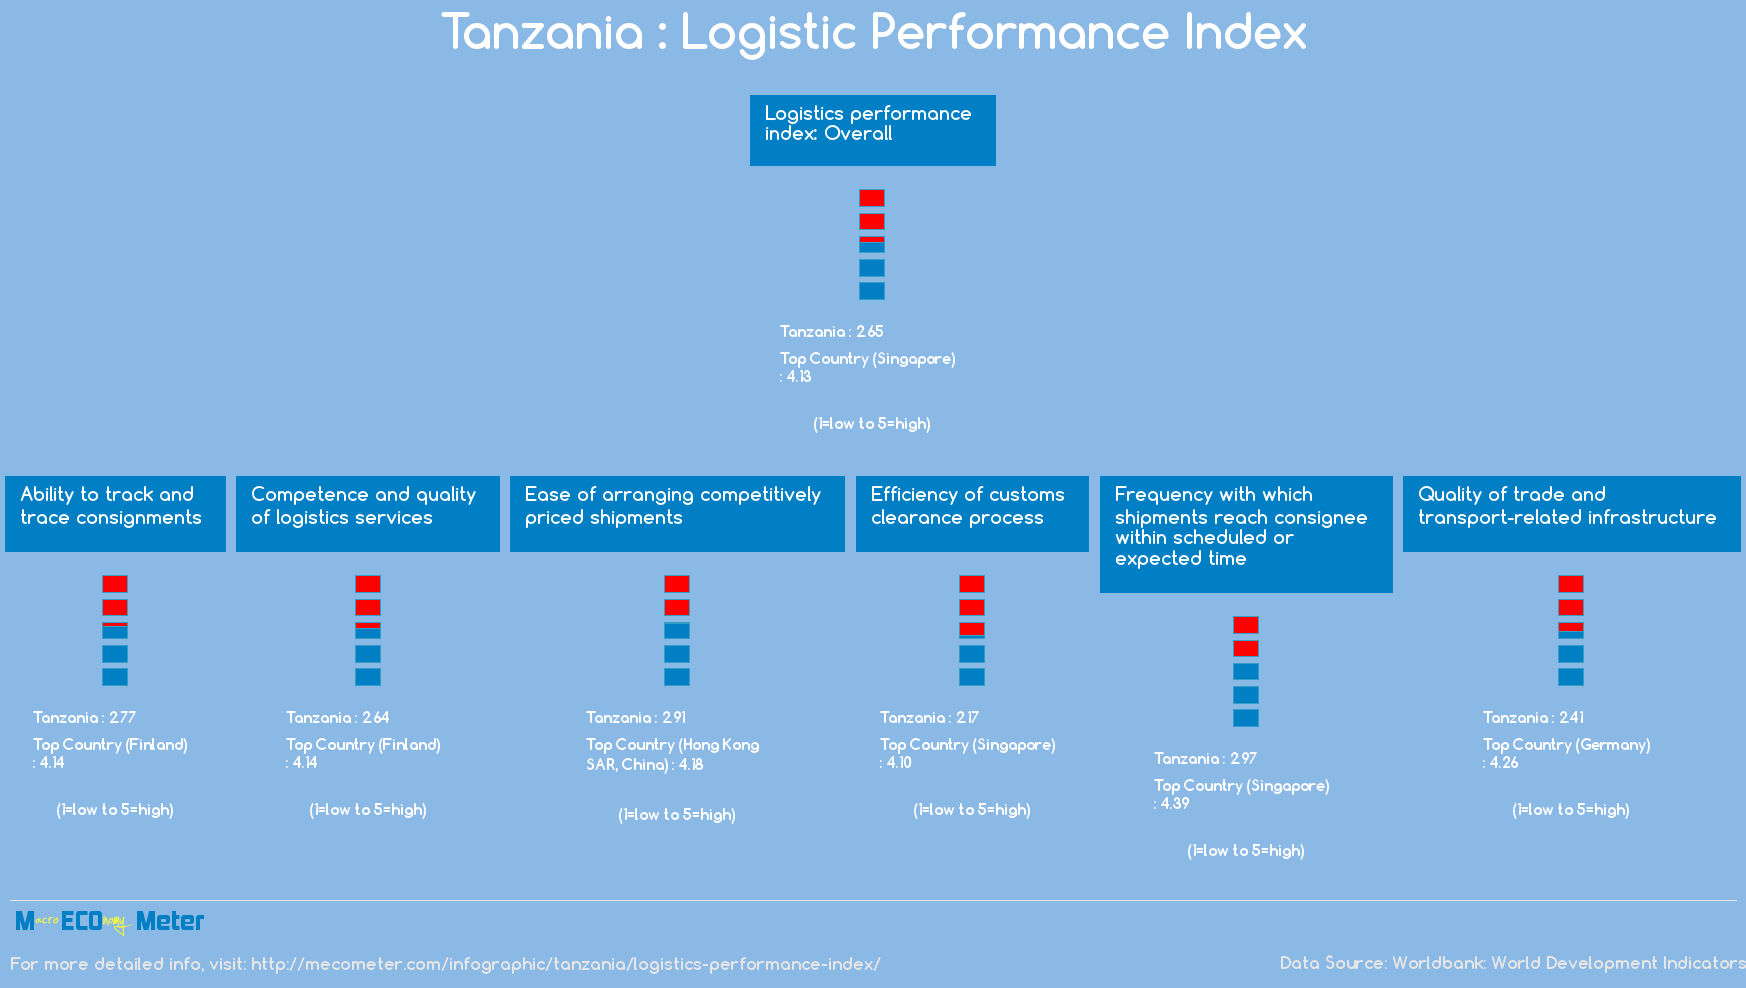 Tanzania : Logistic Performance Index